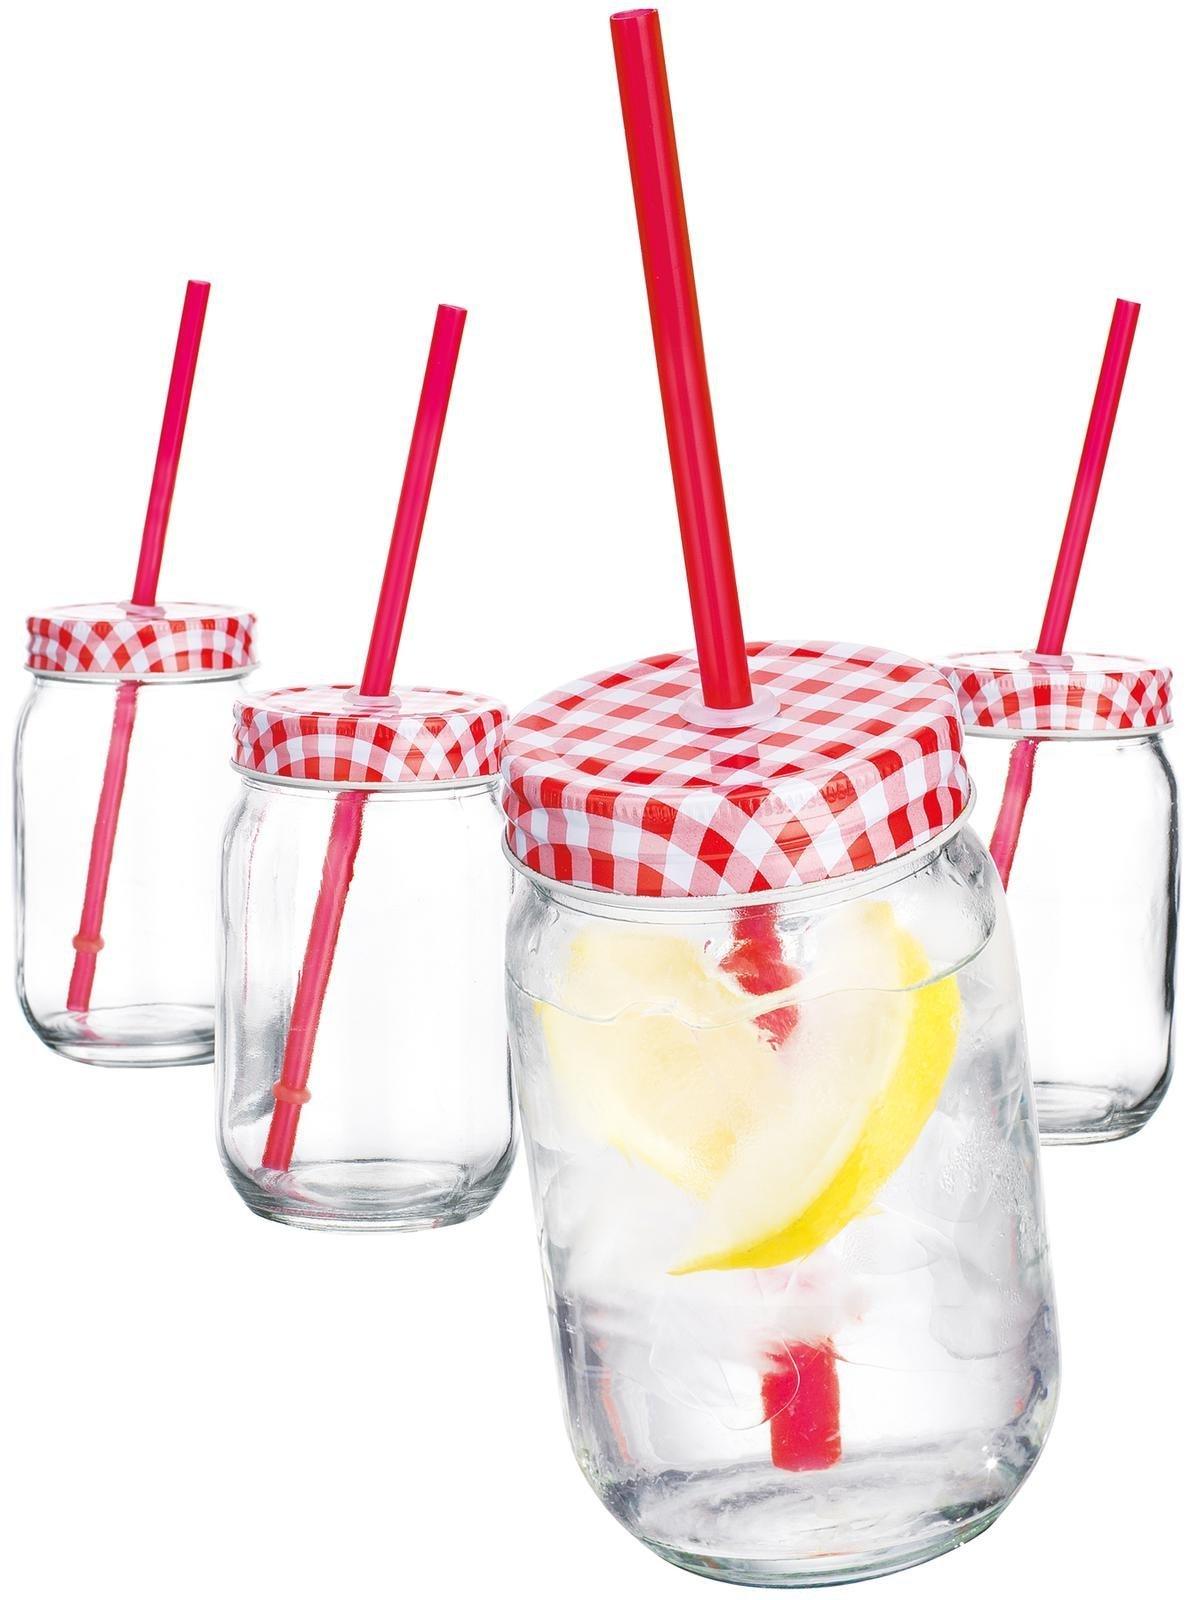 Home Essentials Red Gingham 16oz Mason Jars w/Straw, Set of 4